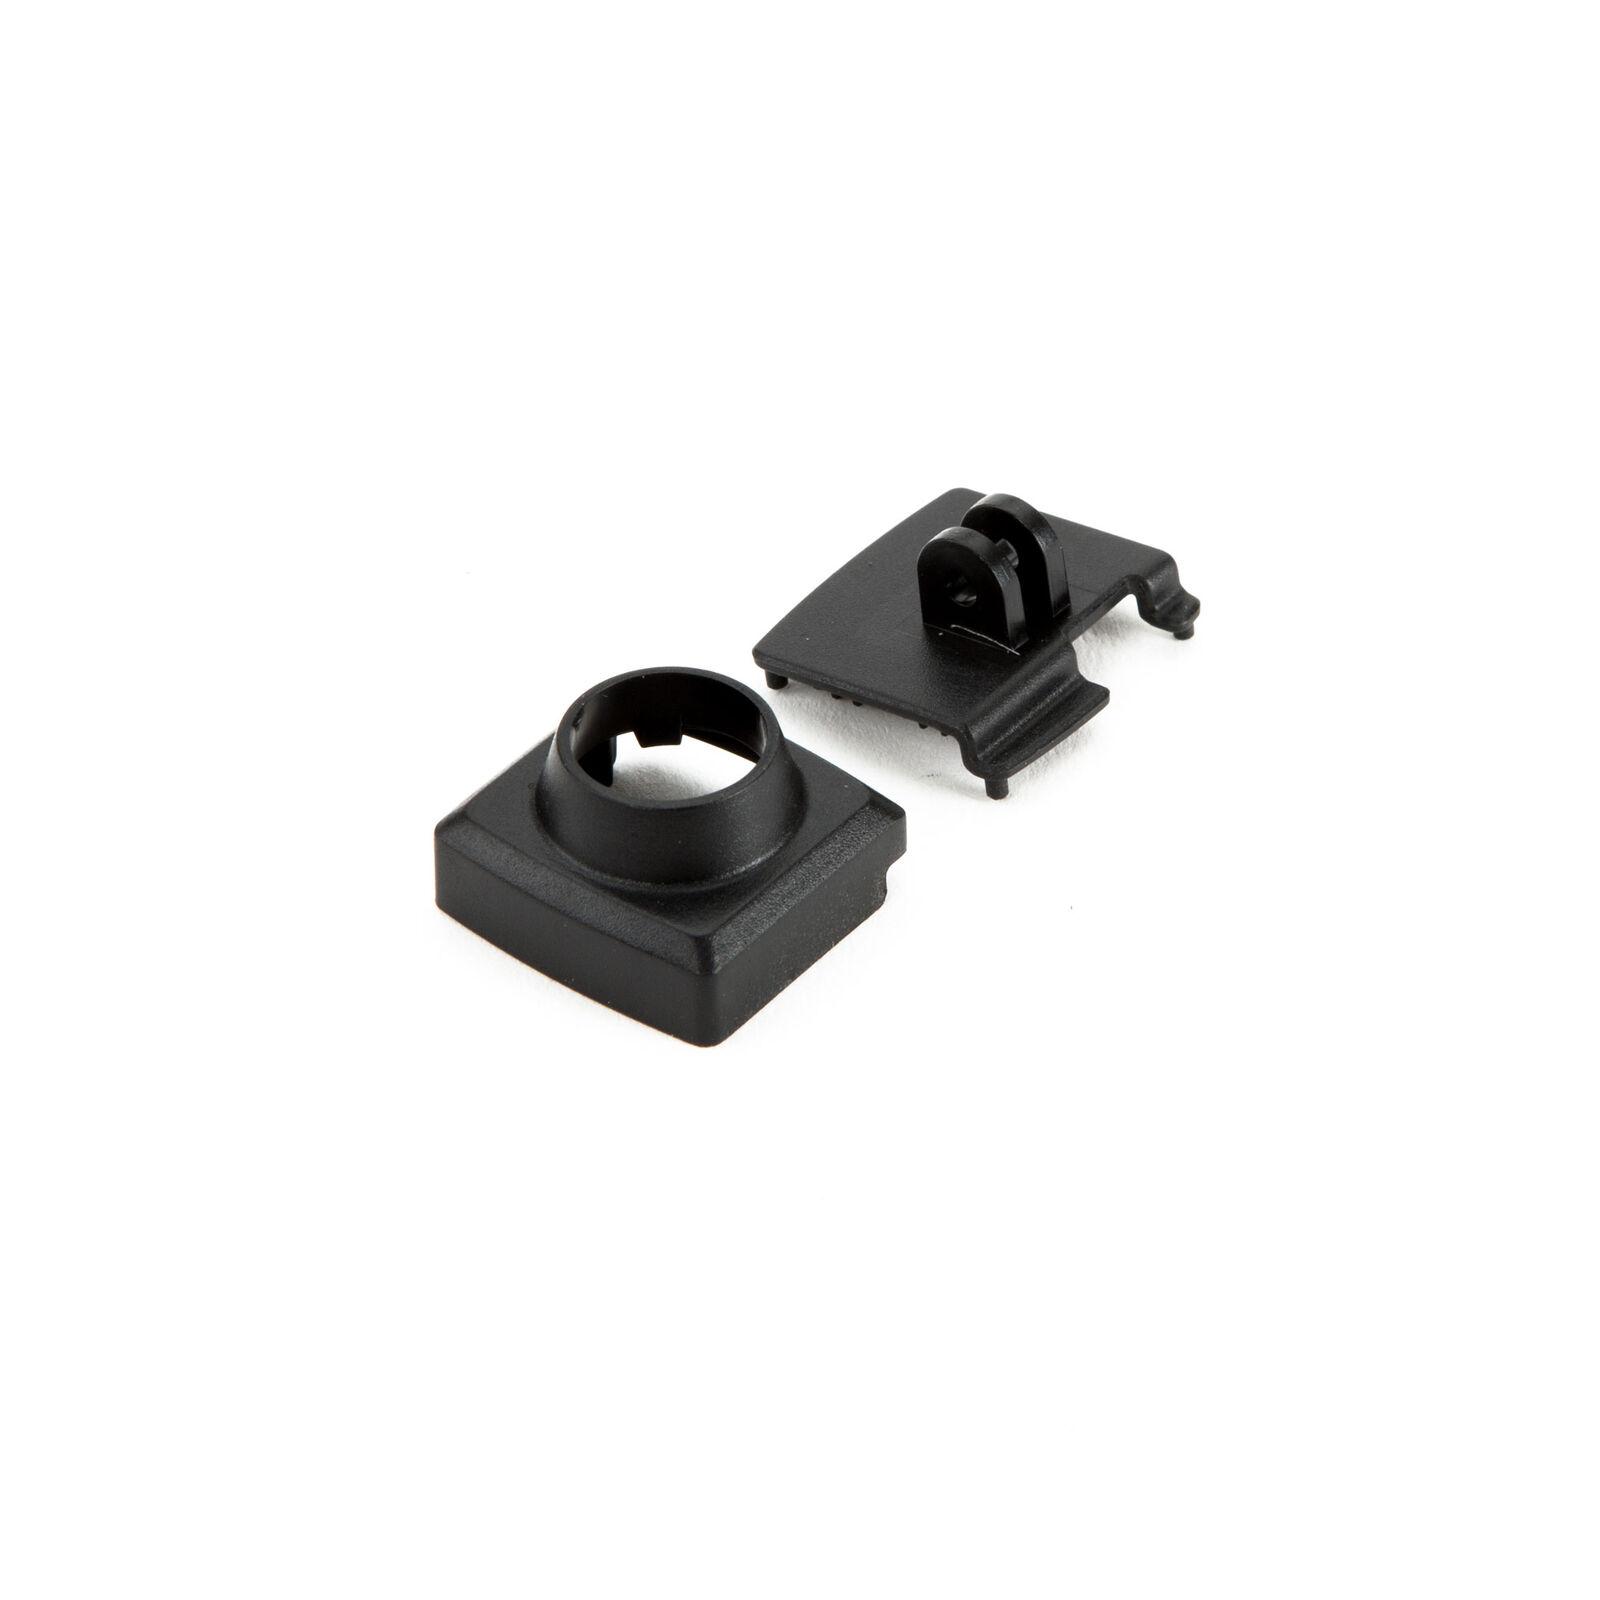 Inductrix 200 - Support caméra